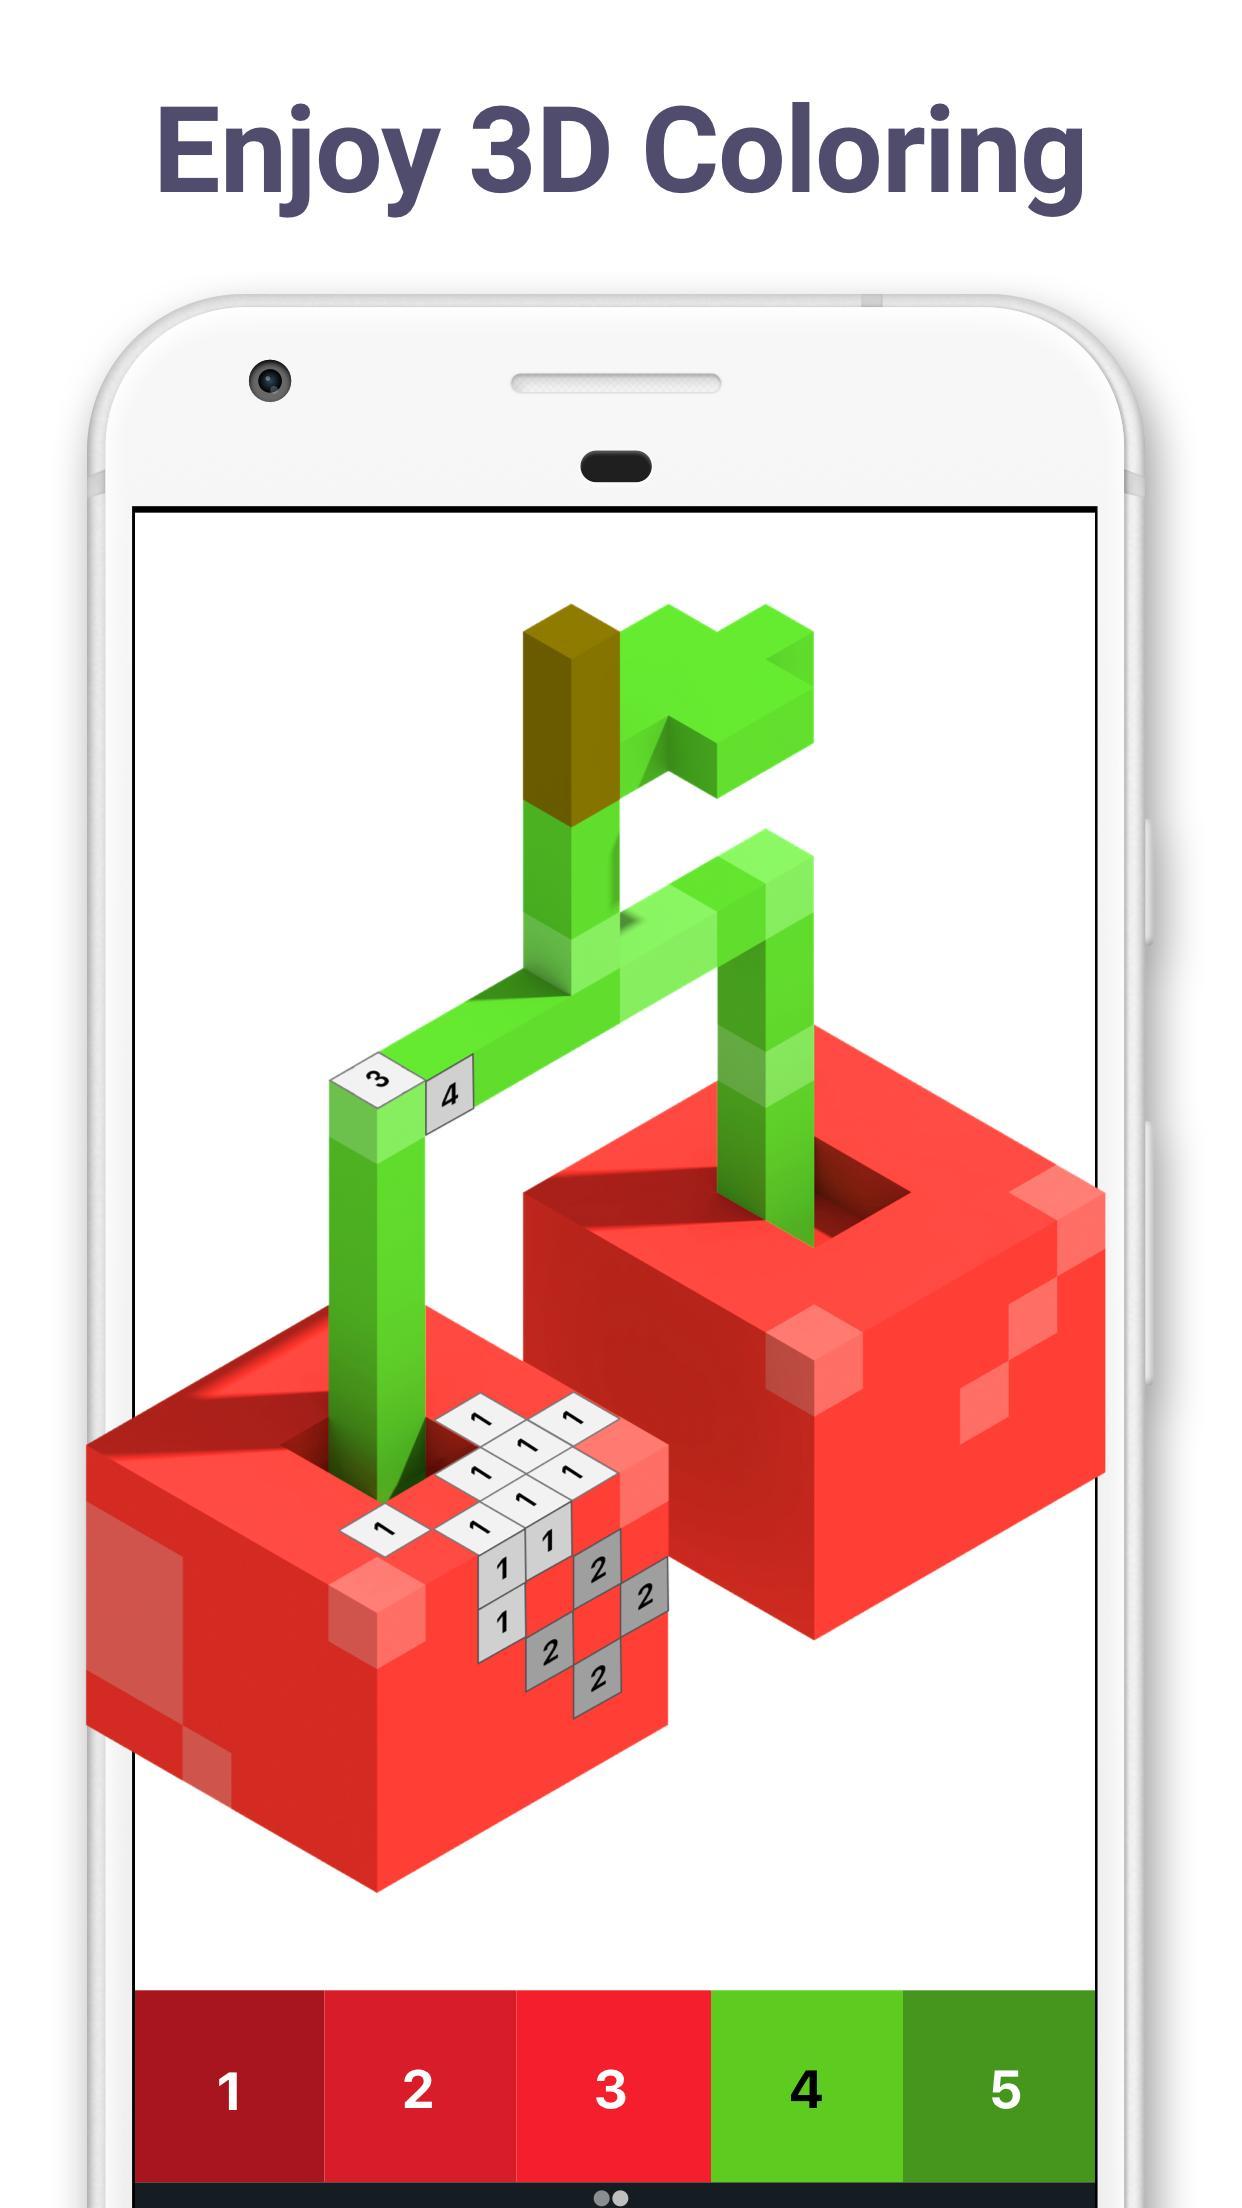 Pixel Art Color by Number 5.1.3 Screenshot 7